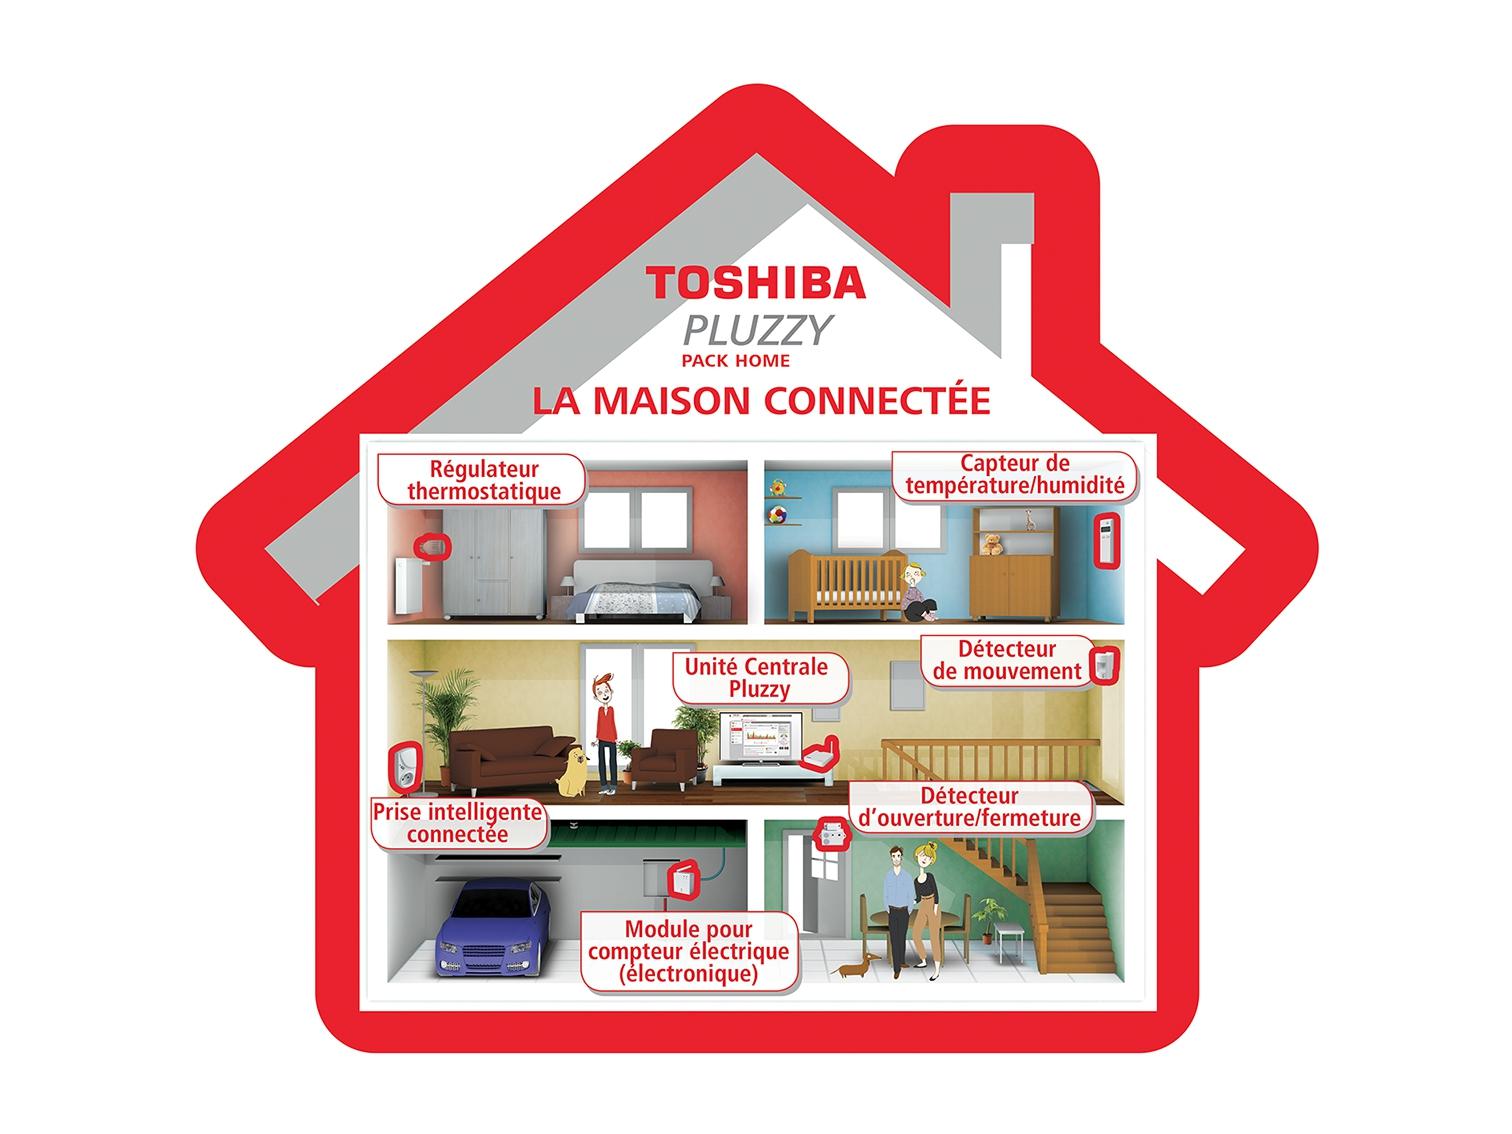 pack domotique home pluzzy toshiba bestofrobots. Black Bedroom Furniture Sets. Home Design Ideas